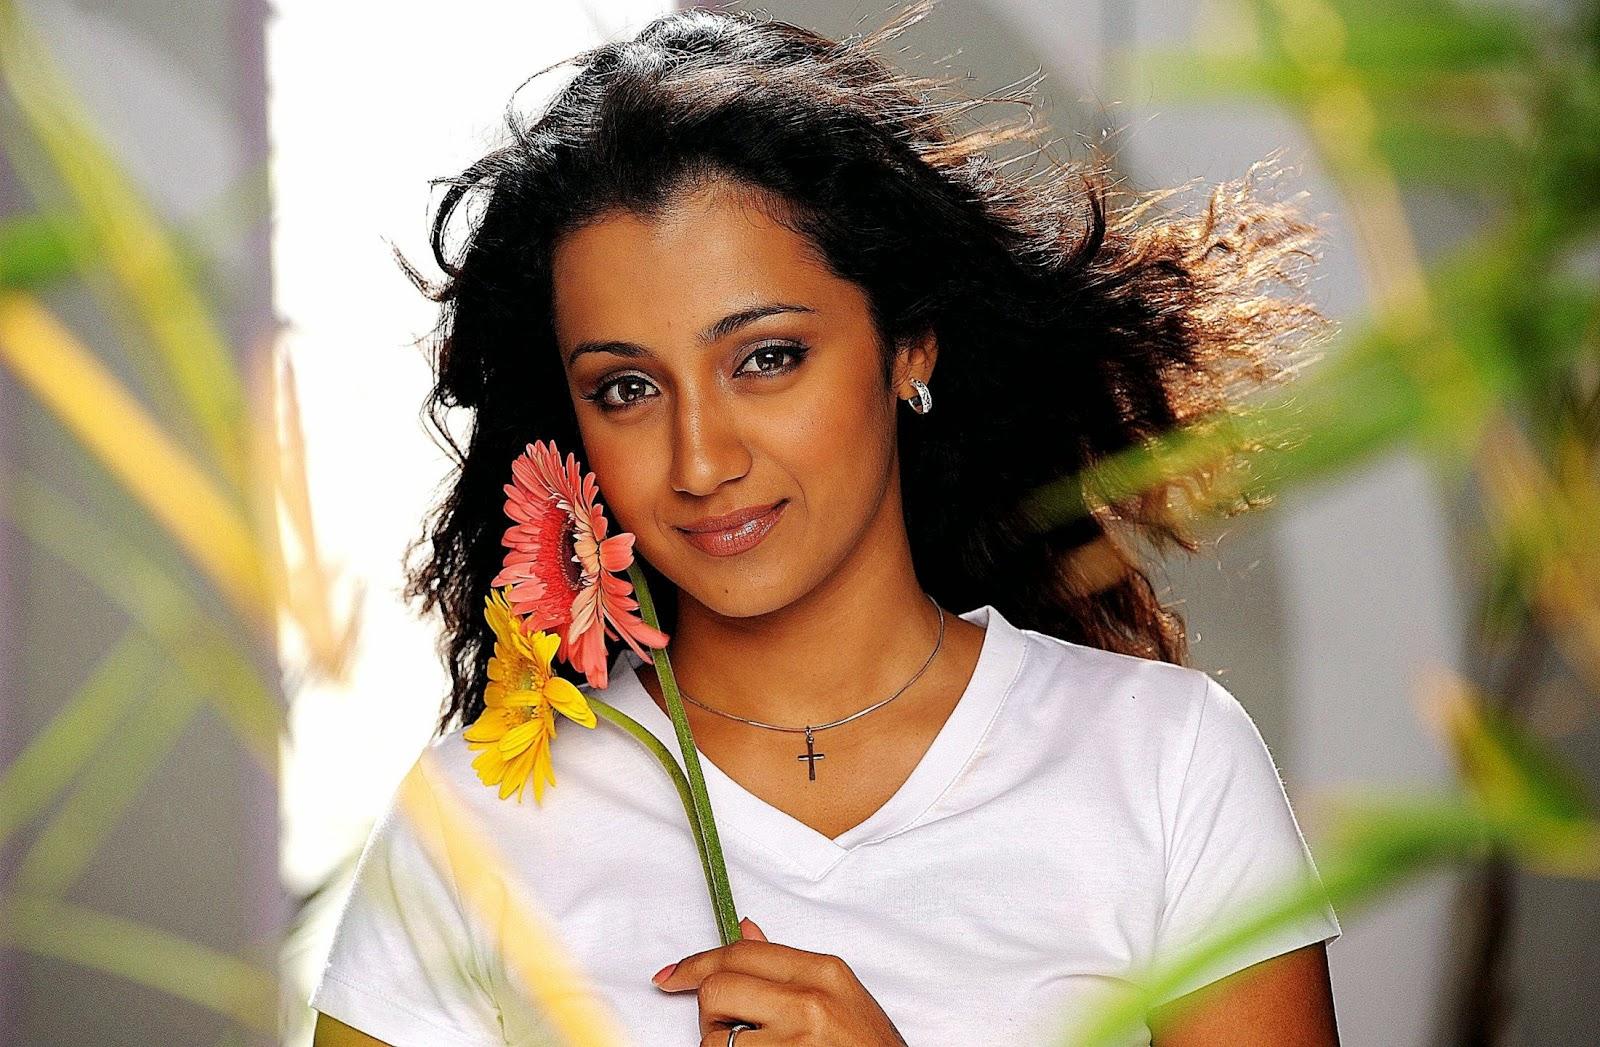 Tamil Actress Hd Wallpaper  Cool Hd Wallpapers